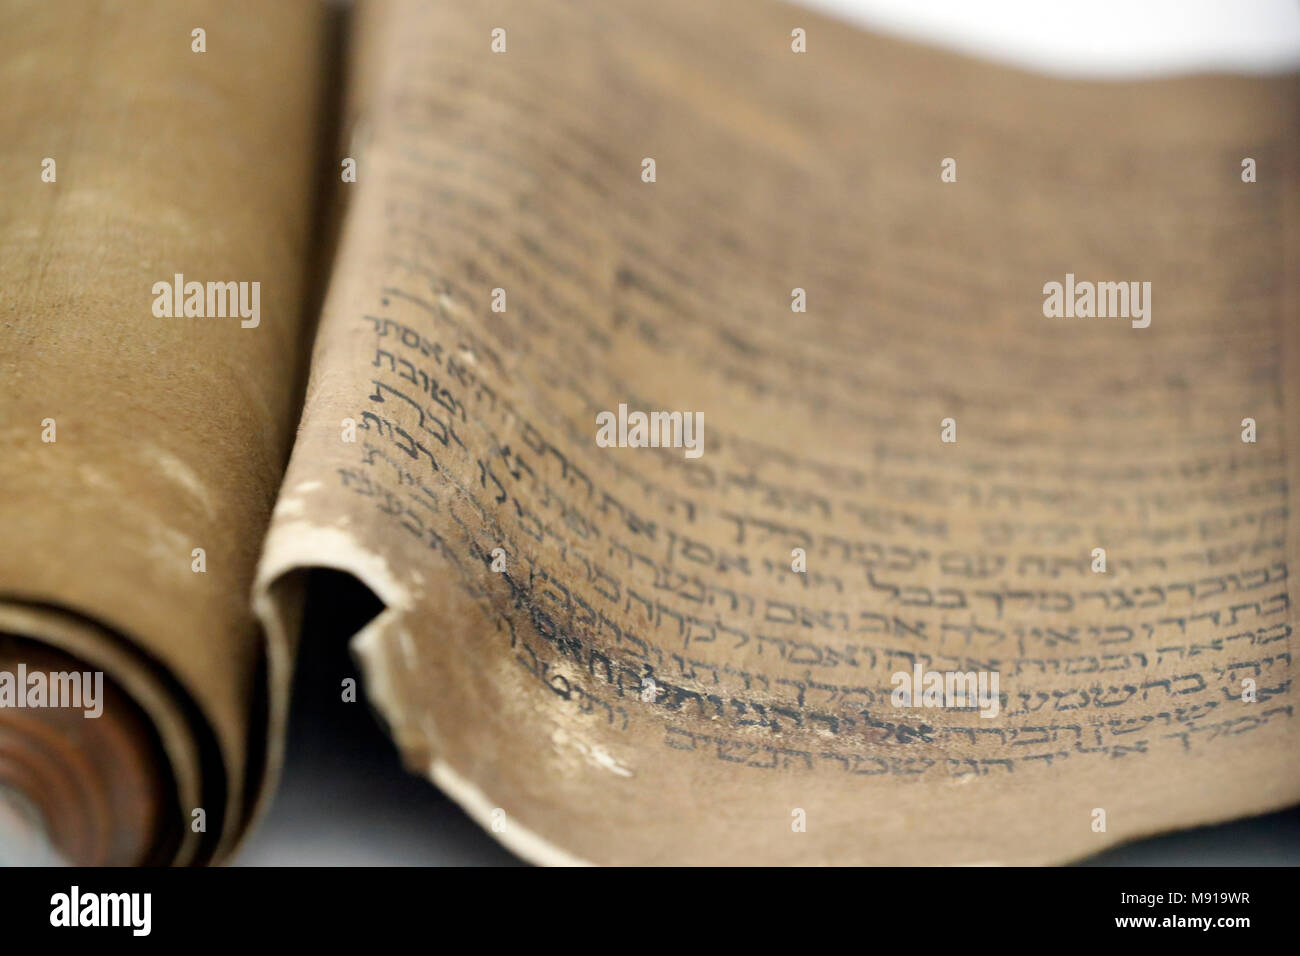 Bartholdi Museum. Blättern des Buches Esther (Meguilah). Aus dem 18. Jahrhundert. Colmar. Frankreich. Stockbild